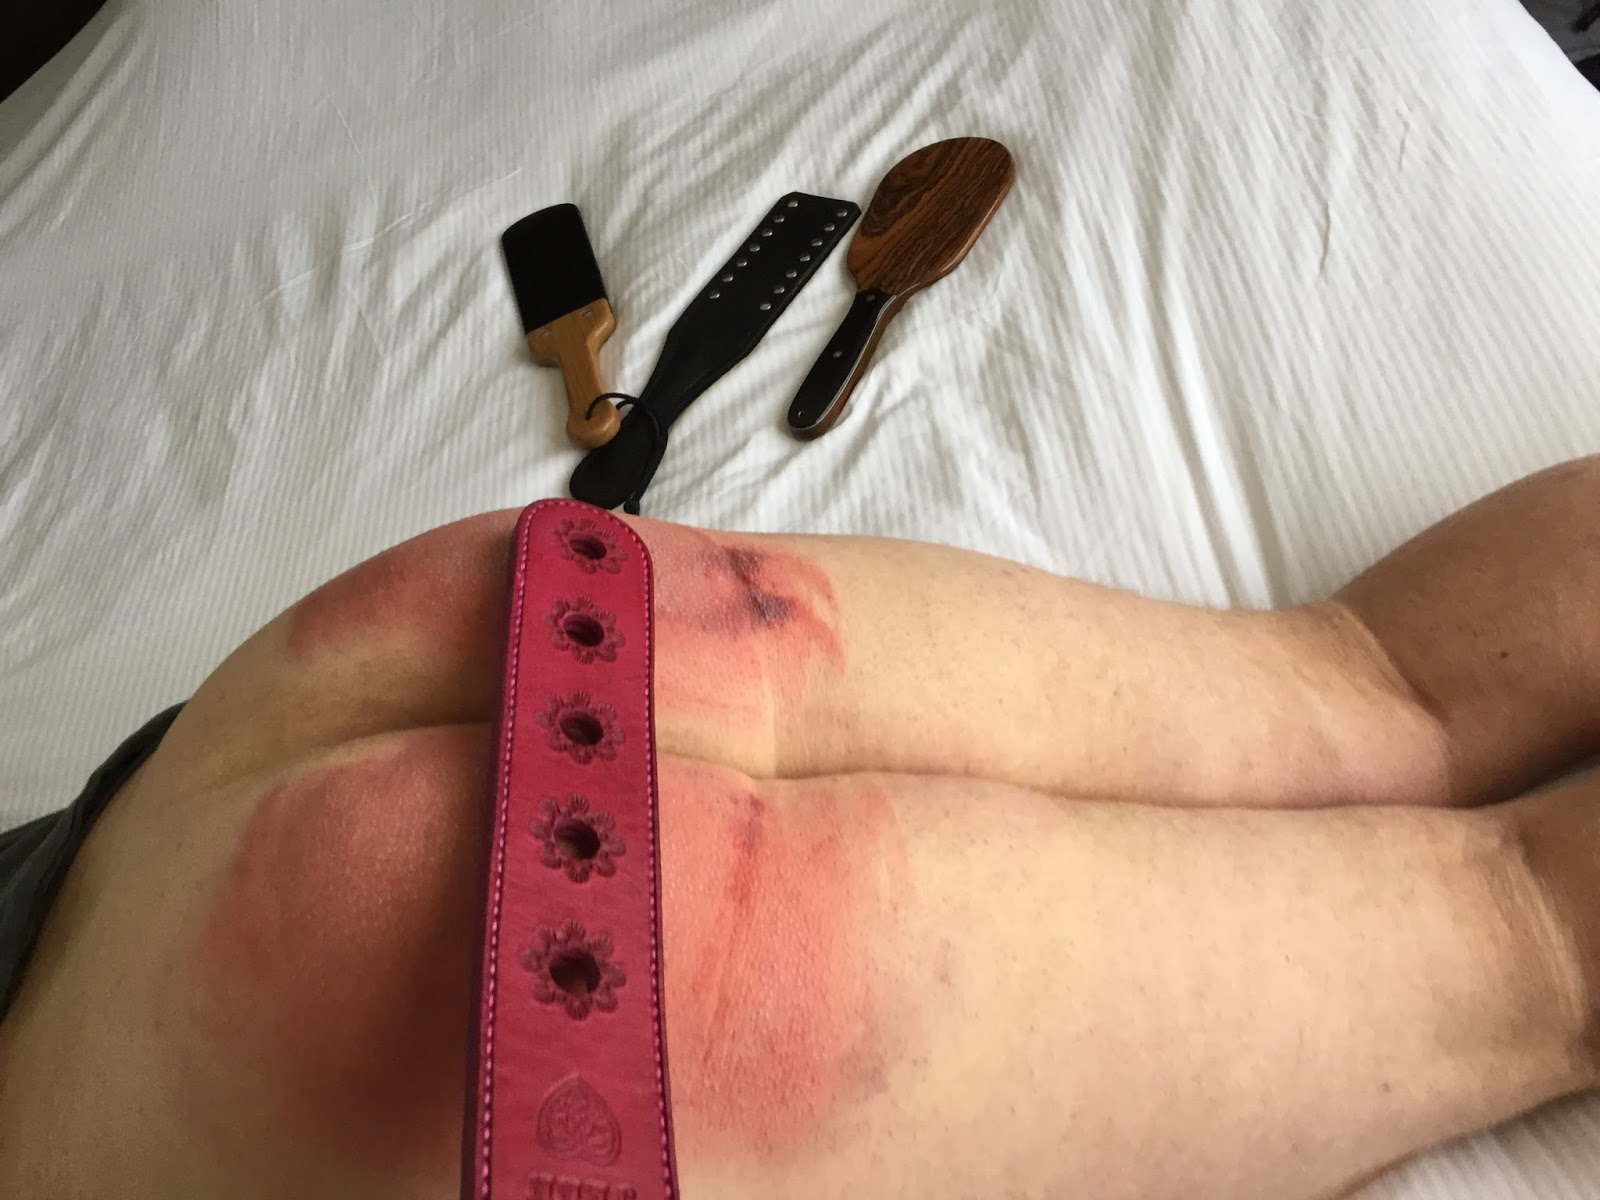 spank-your-bottom-so-hard